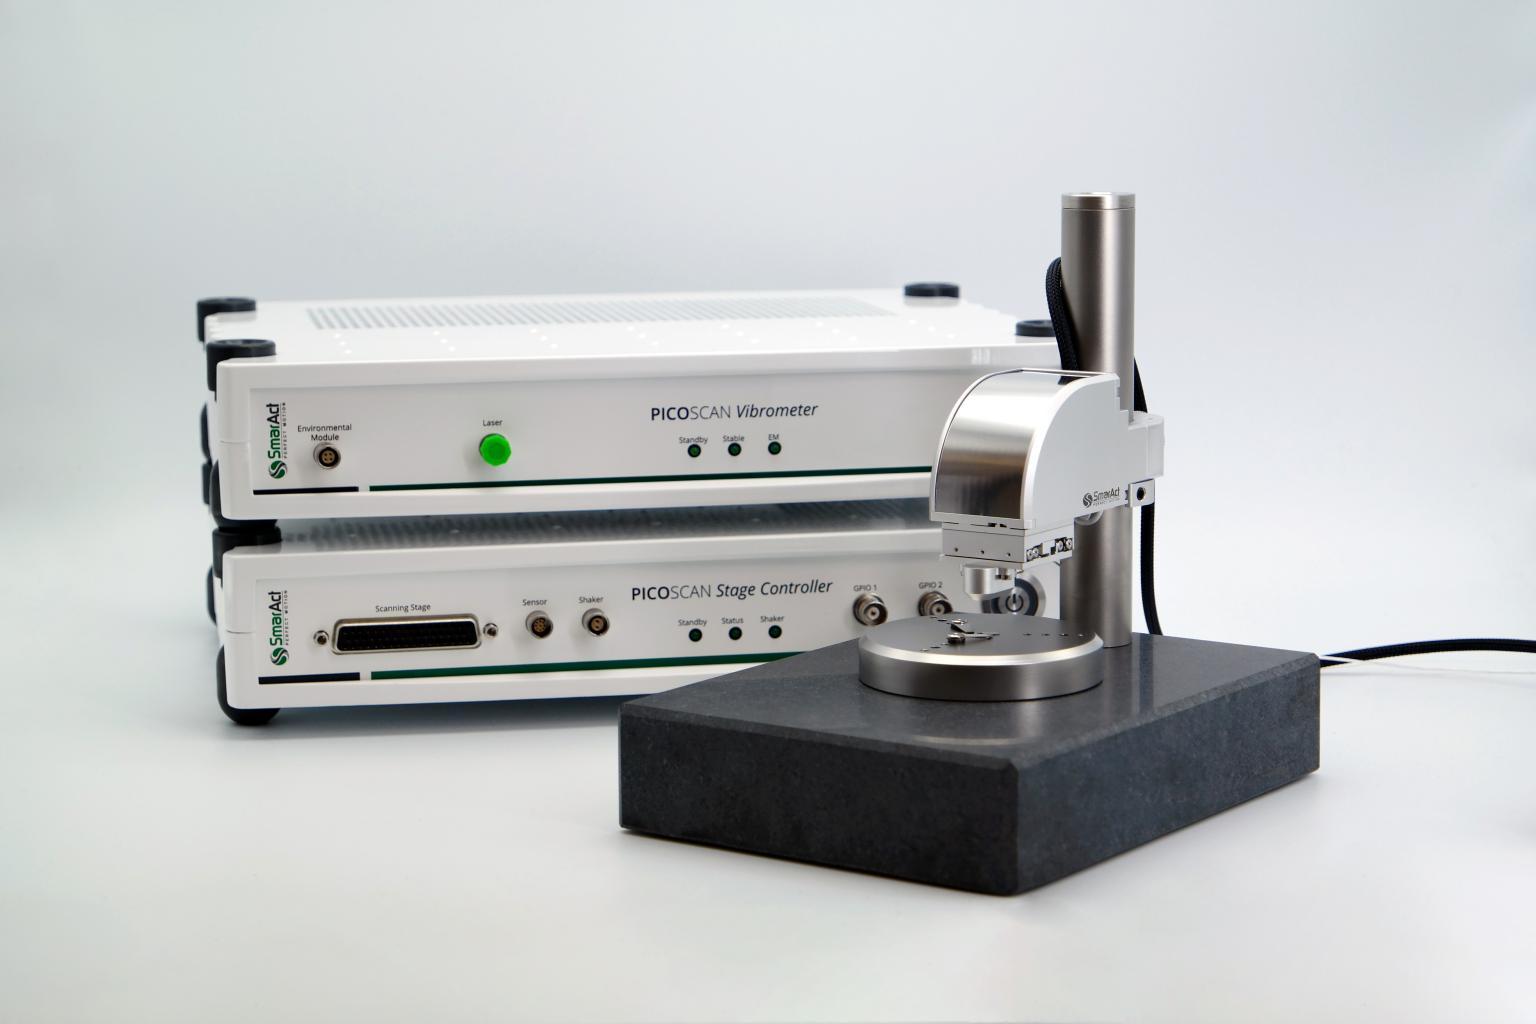 PICOSCALE Vibrometer for vibration measurement